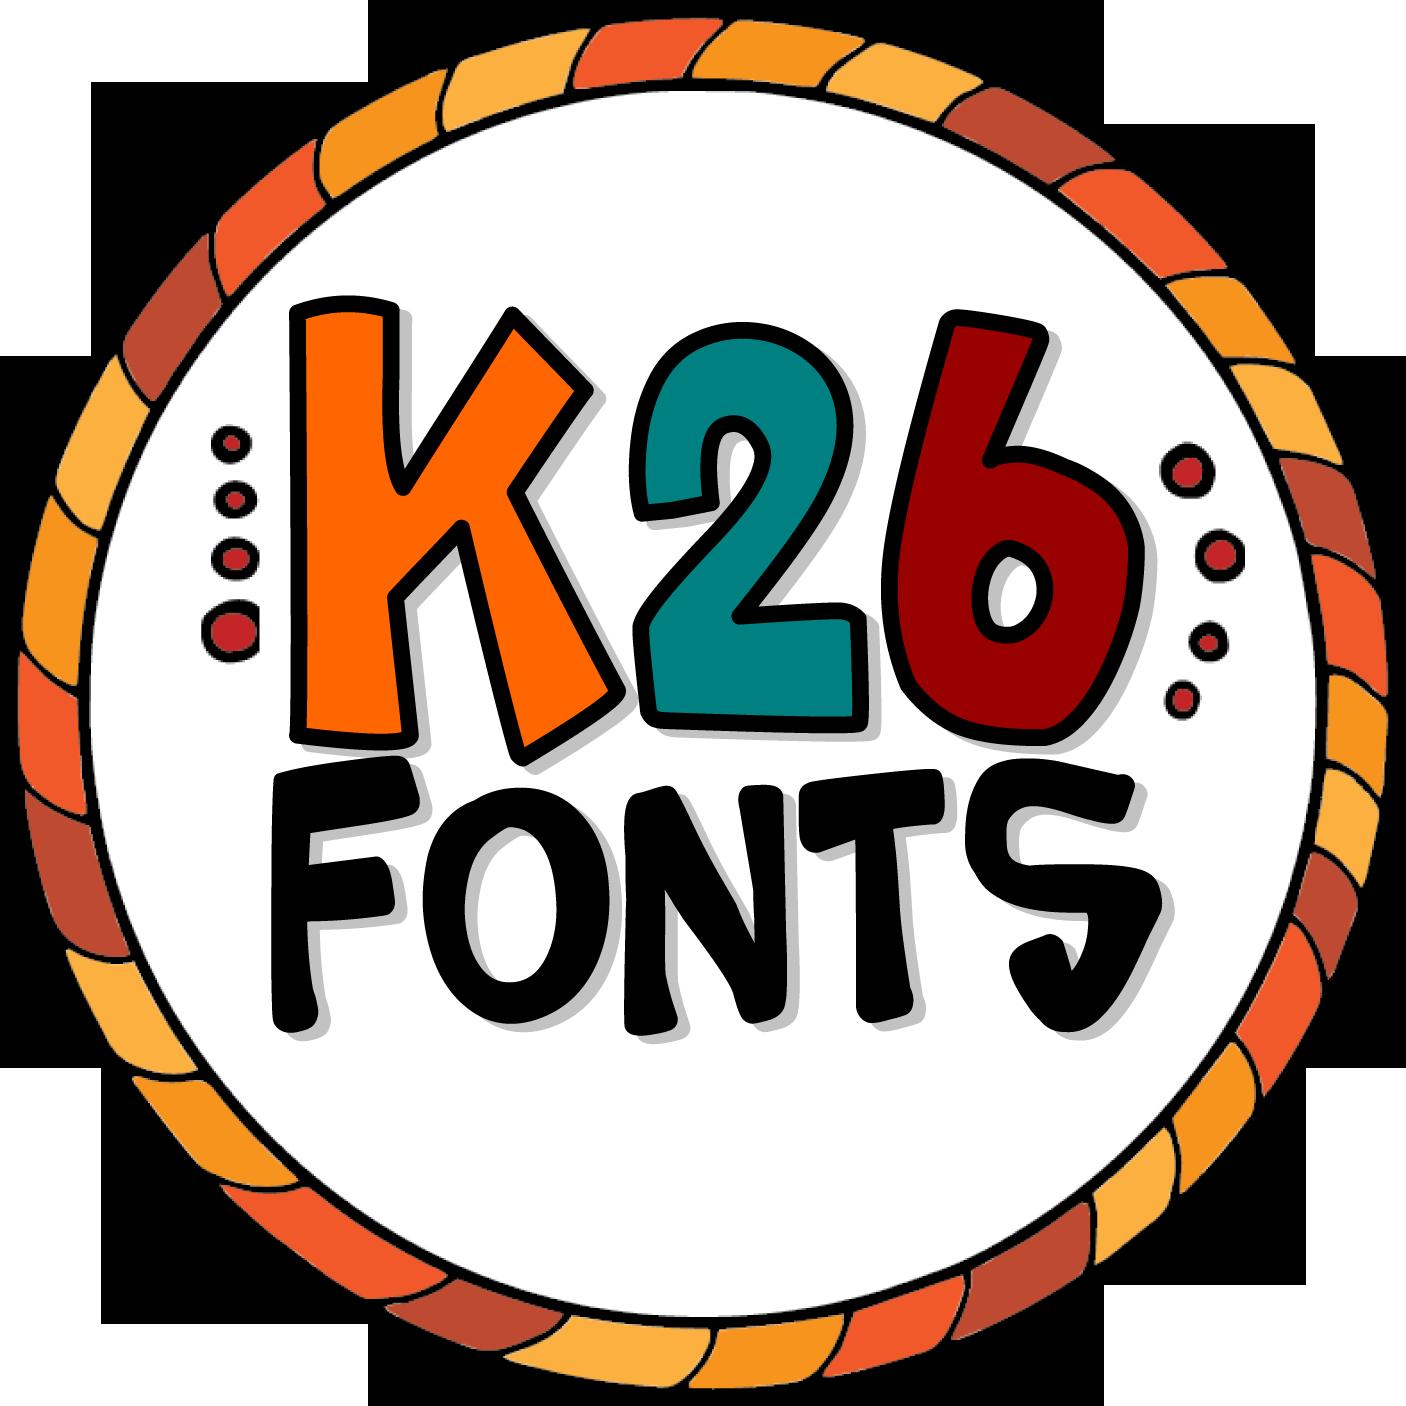 K26 Fonts avatar